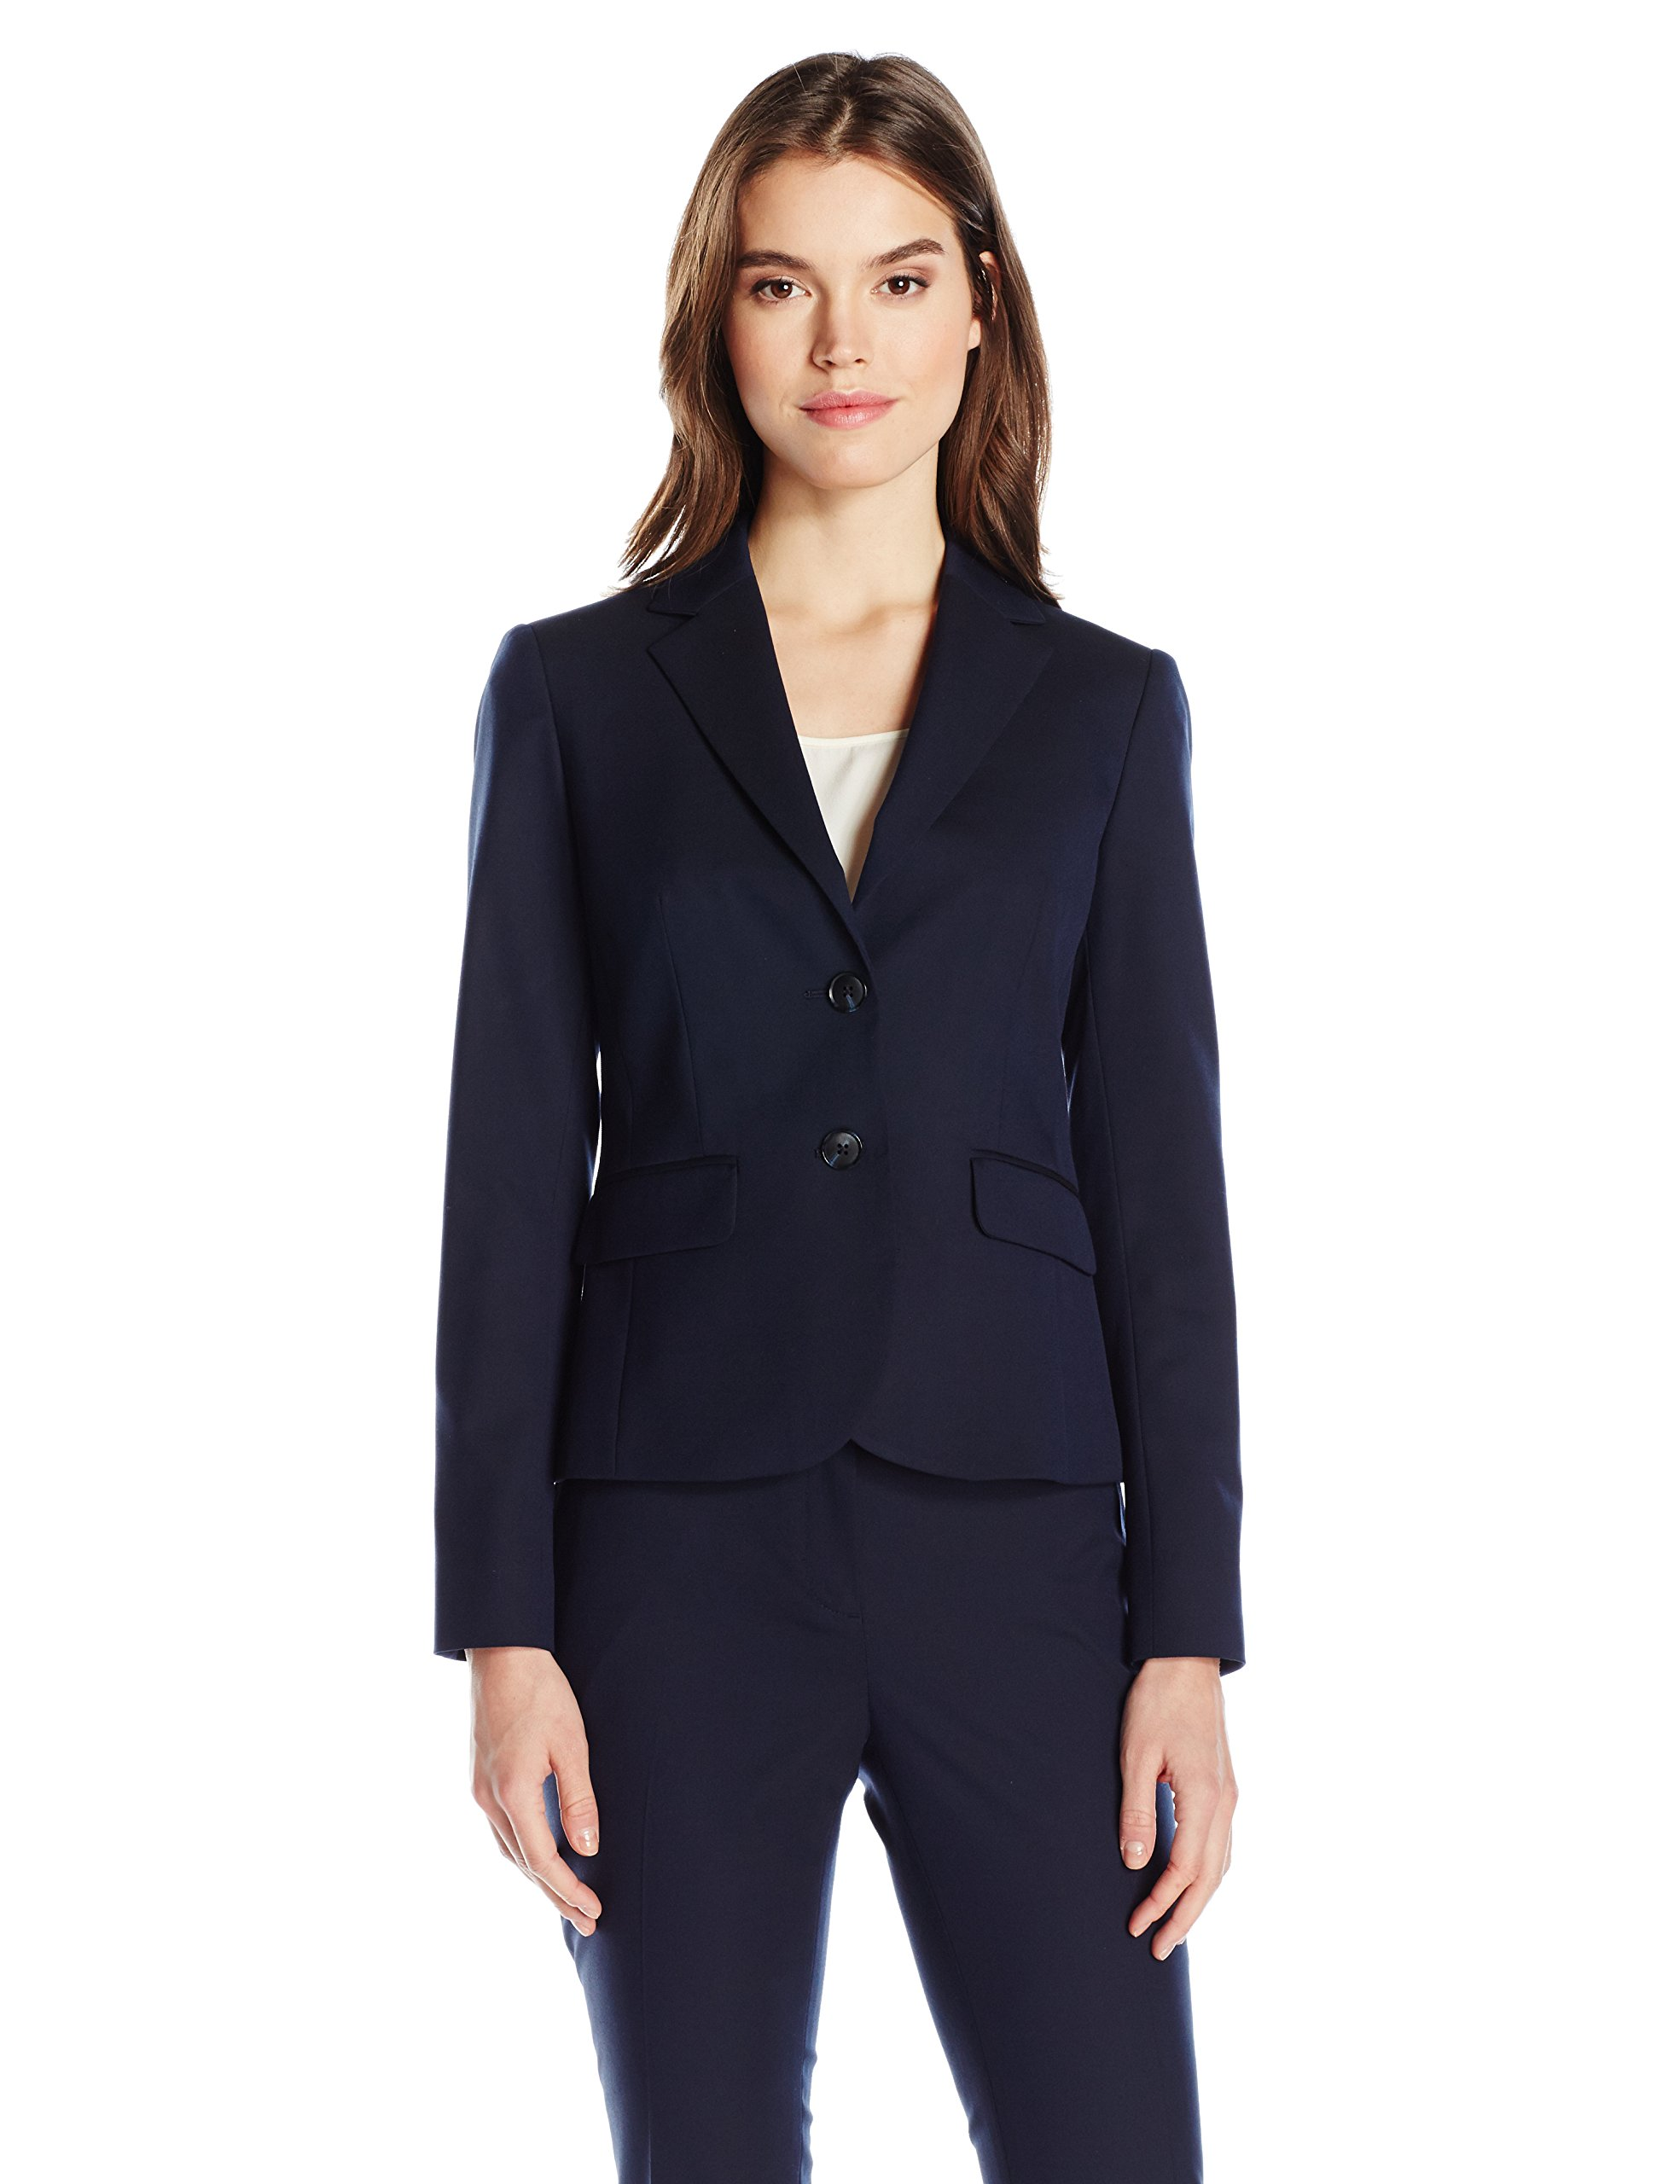 Jones New York Women's Washable Suiting Short 2 Btn Jacket, Navy, 4